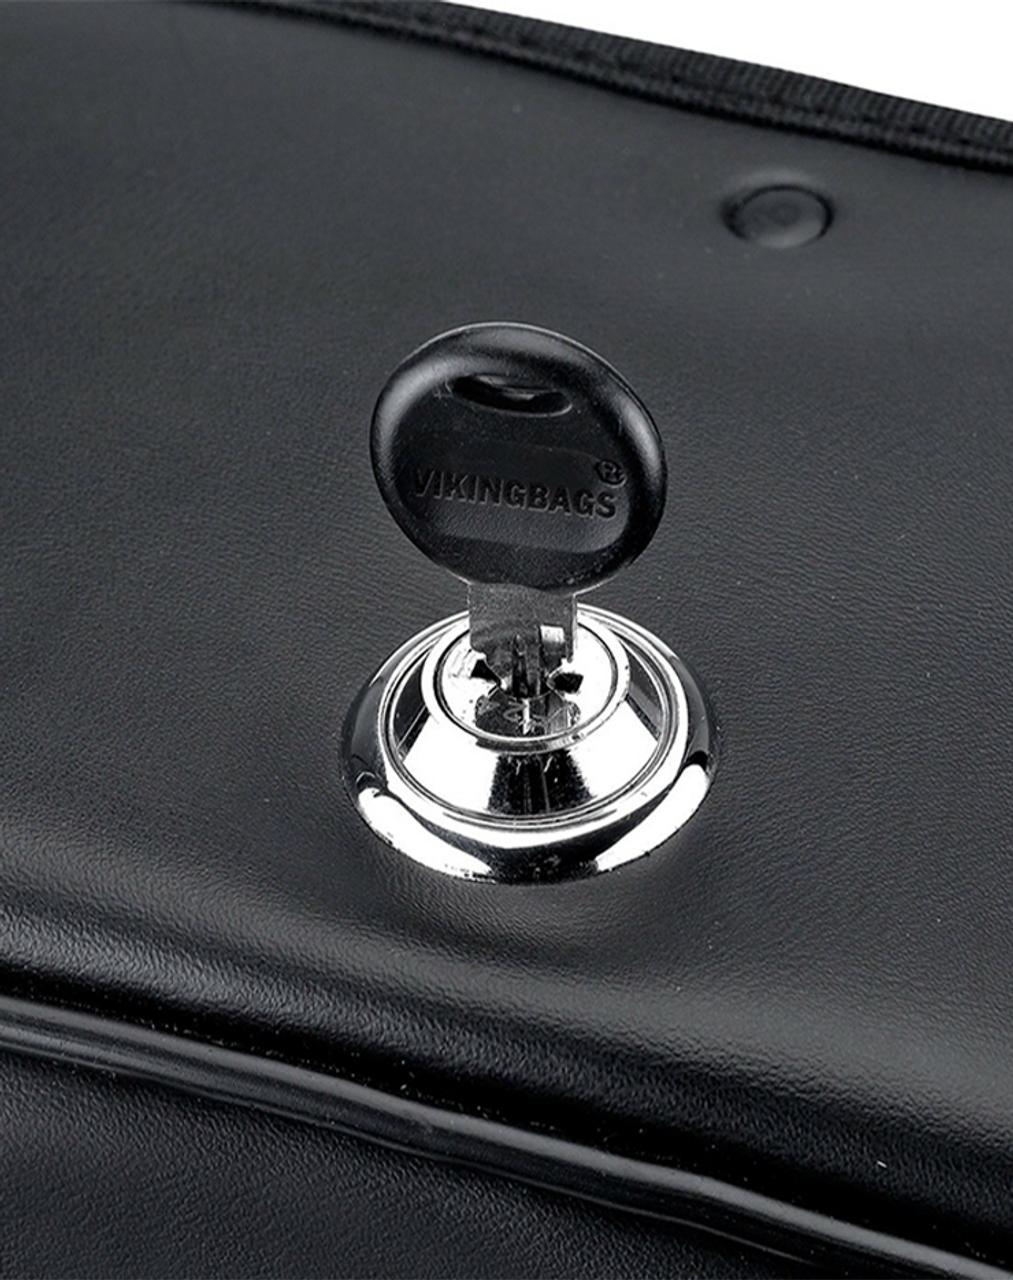 Triumph Thunderbird Shock Cutout Slanted Studded Large Motorcycle Saddlebags Key Lockable View